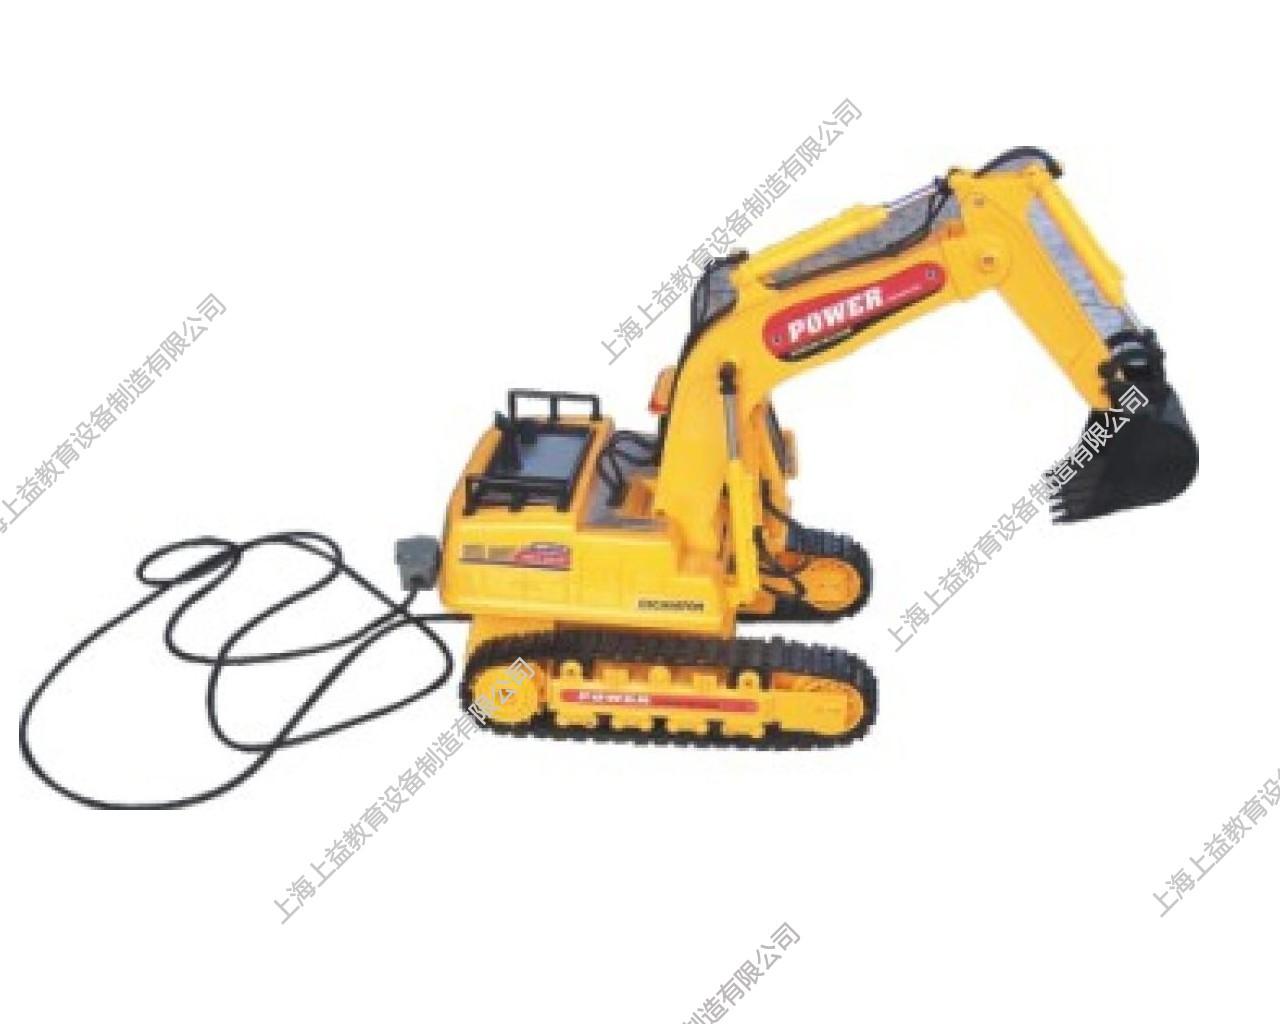 JDM-01挖土机wwwlehu8vip模型